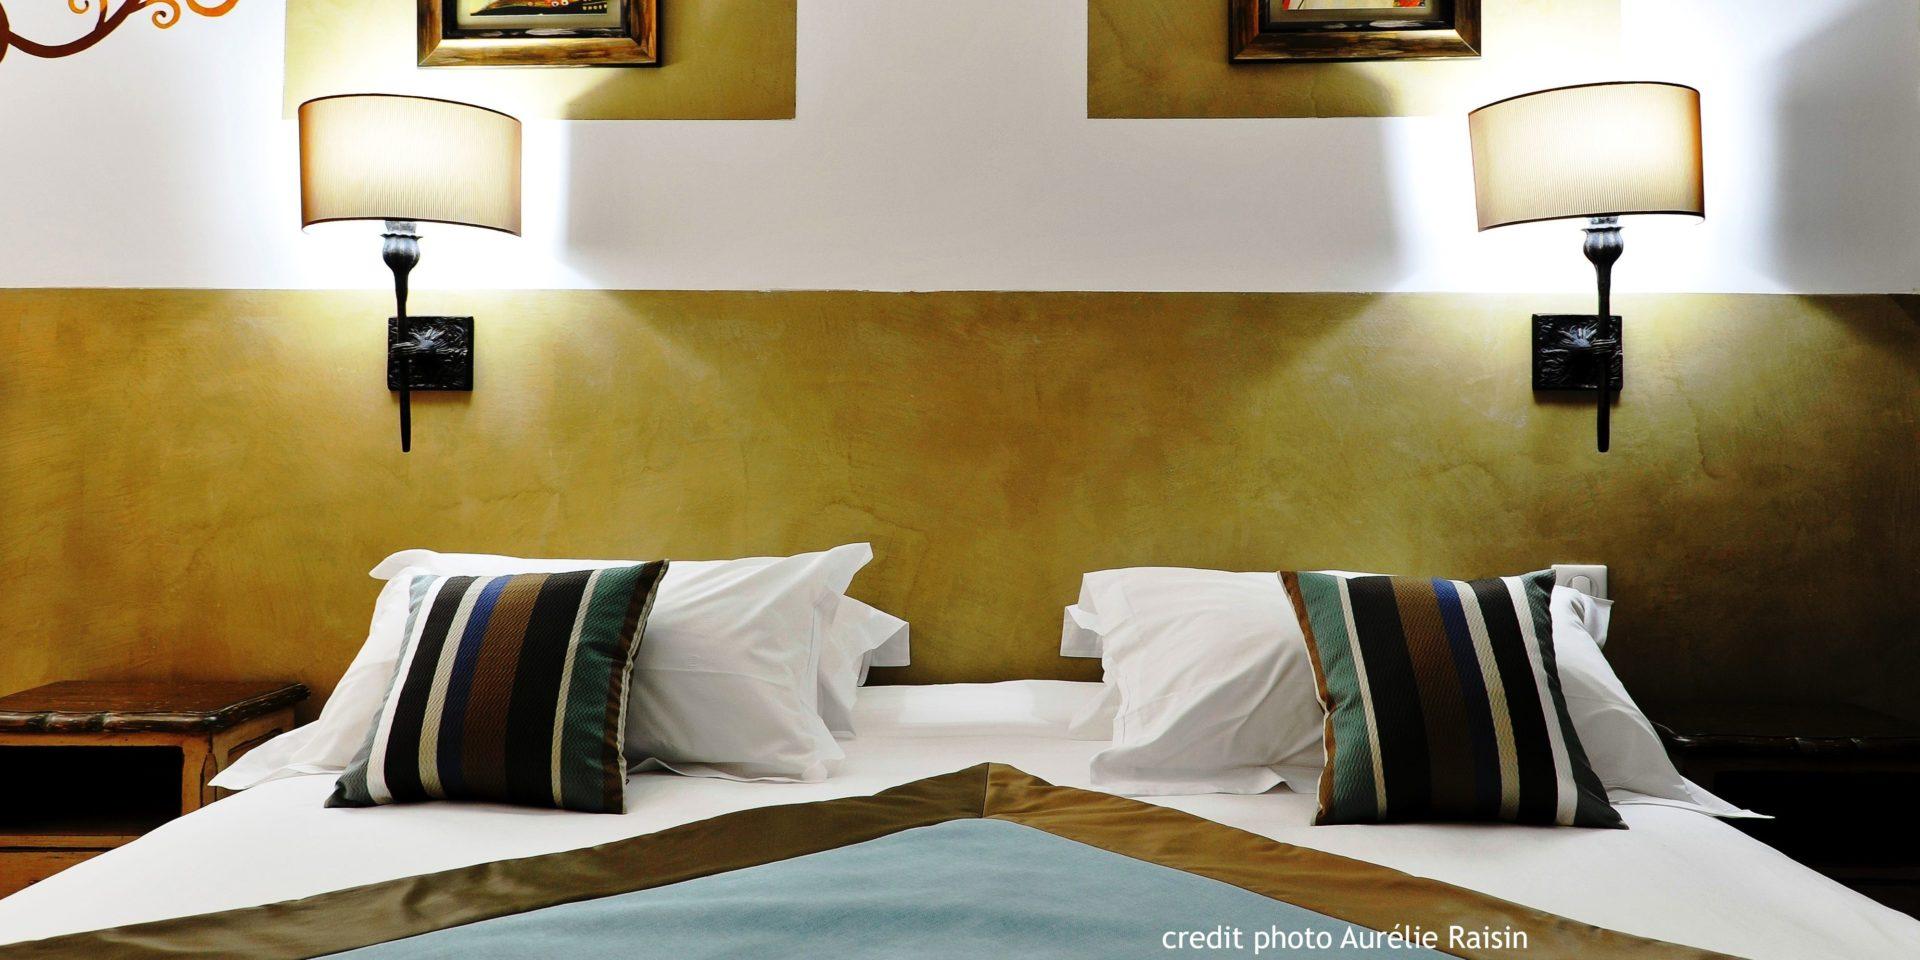 Boutique Hotel Liberata Ile Rousse Balagne Corsica Frankrijk kamer tweepersoonsbed kunst detail